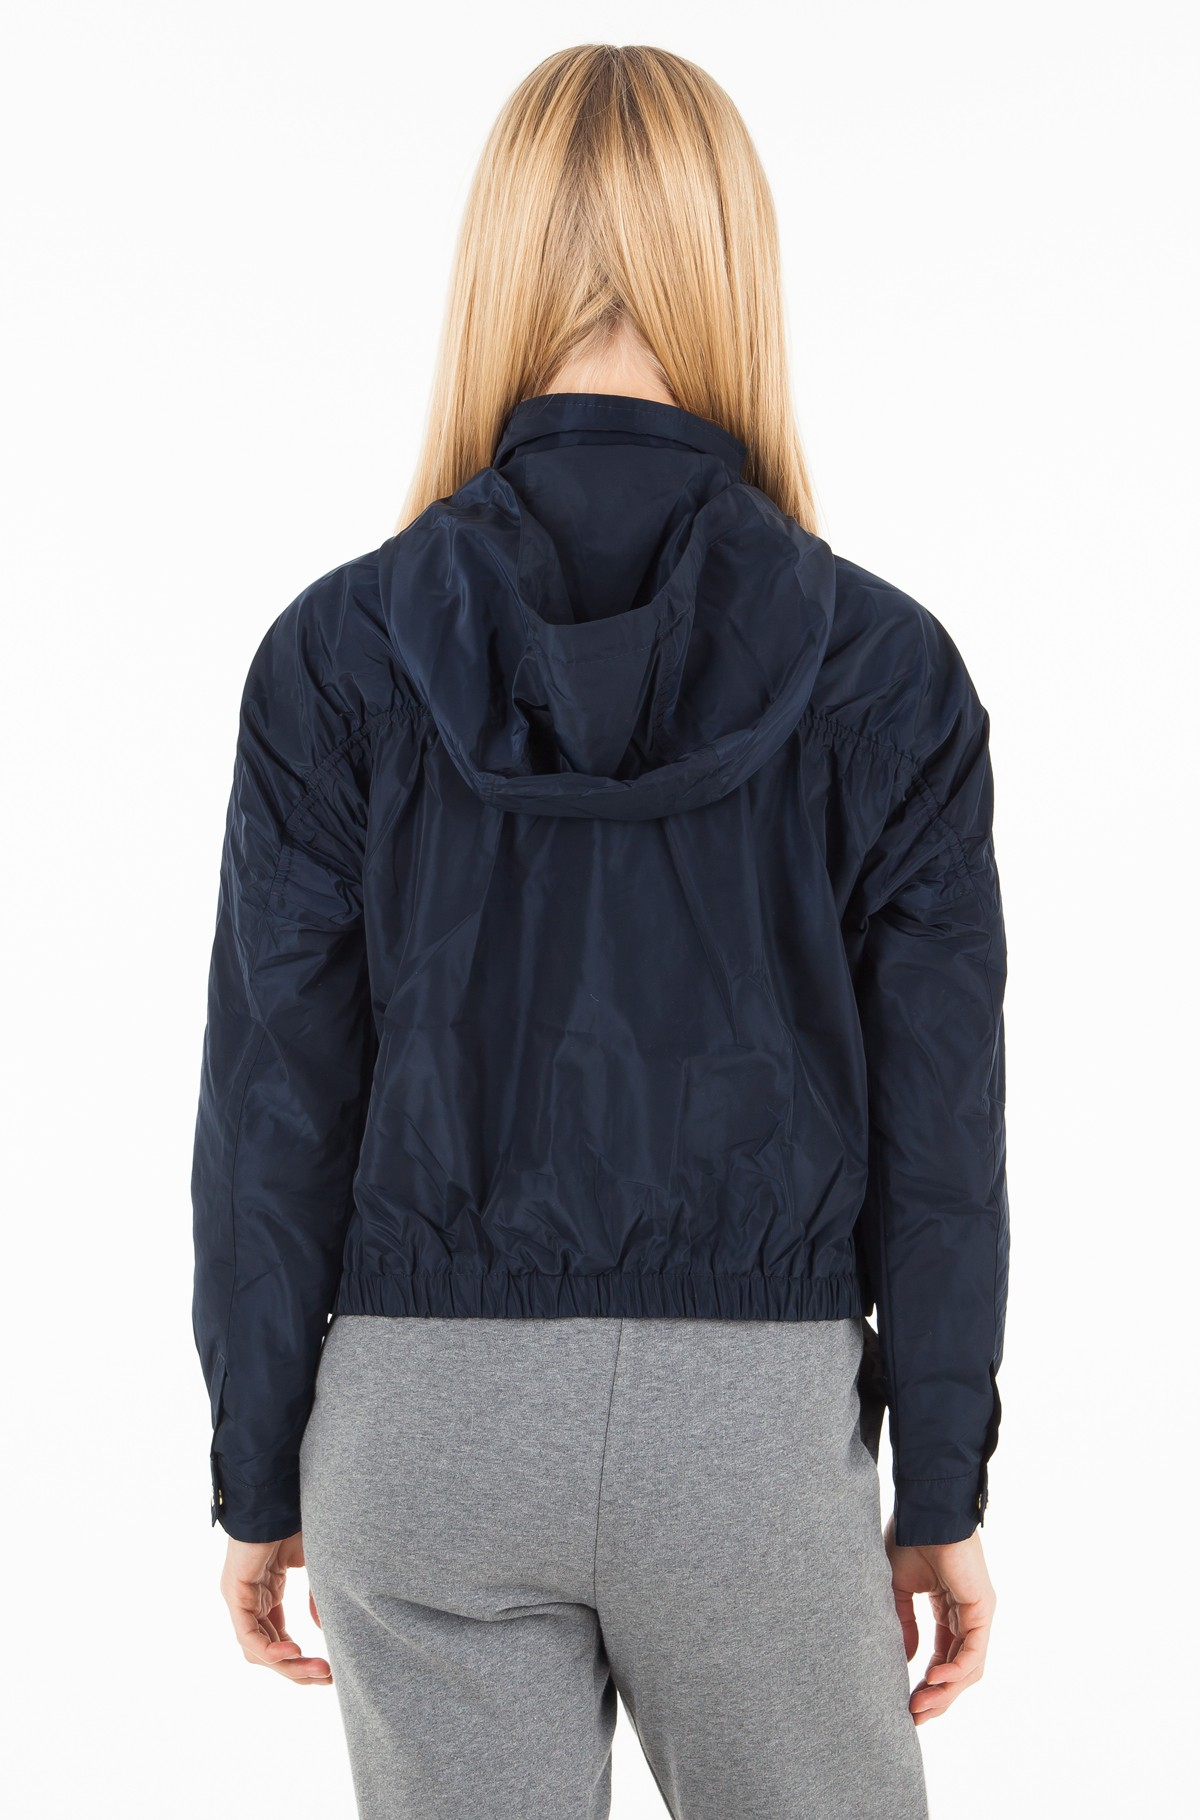 Plastic jacket  CORY SHORT PARKA-full-2